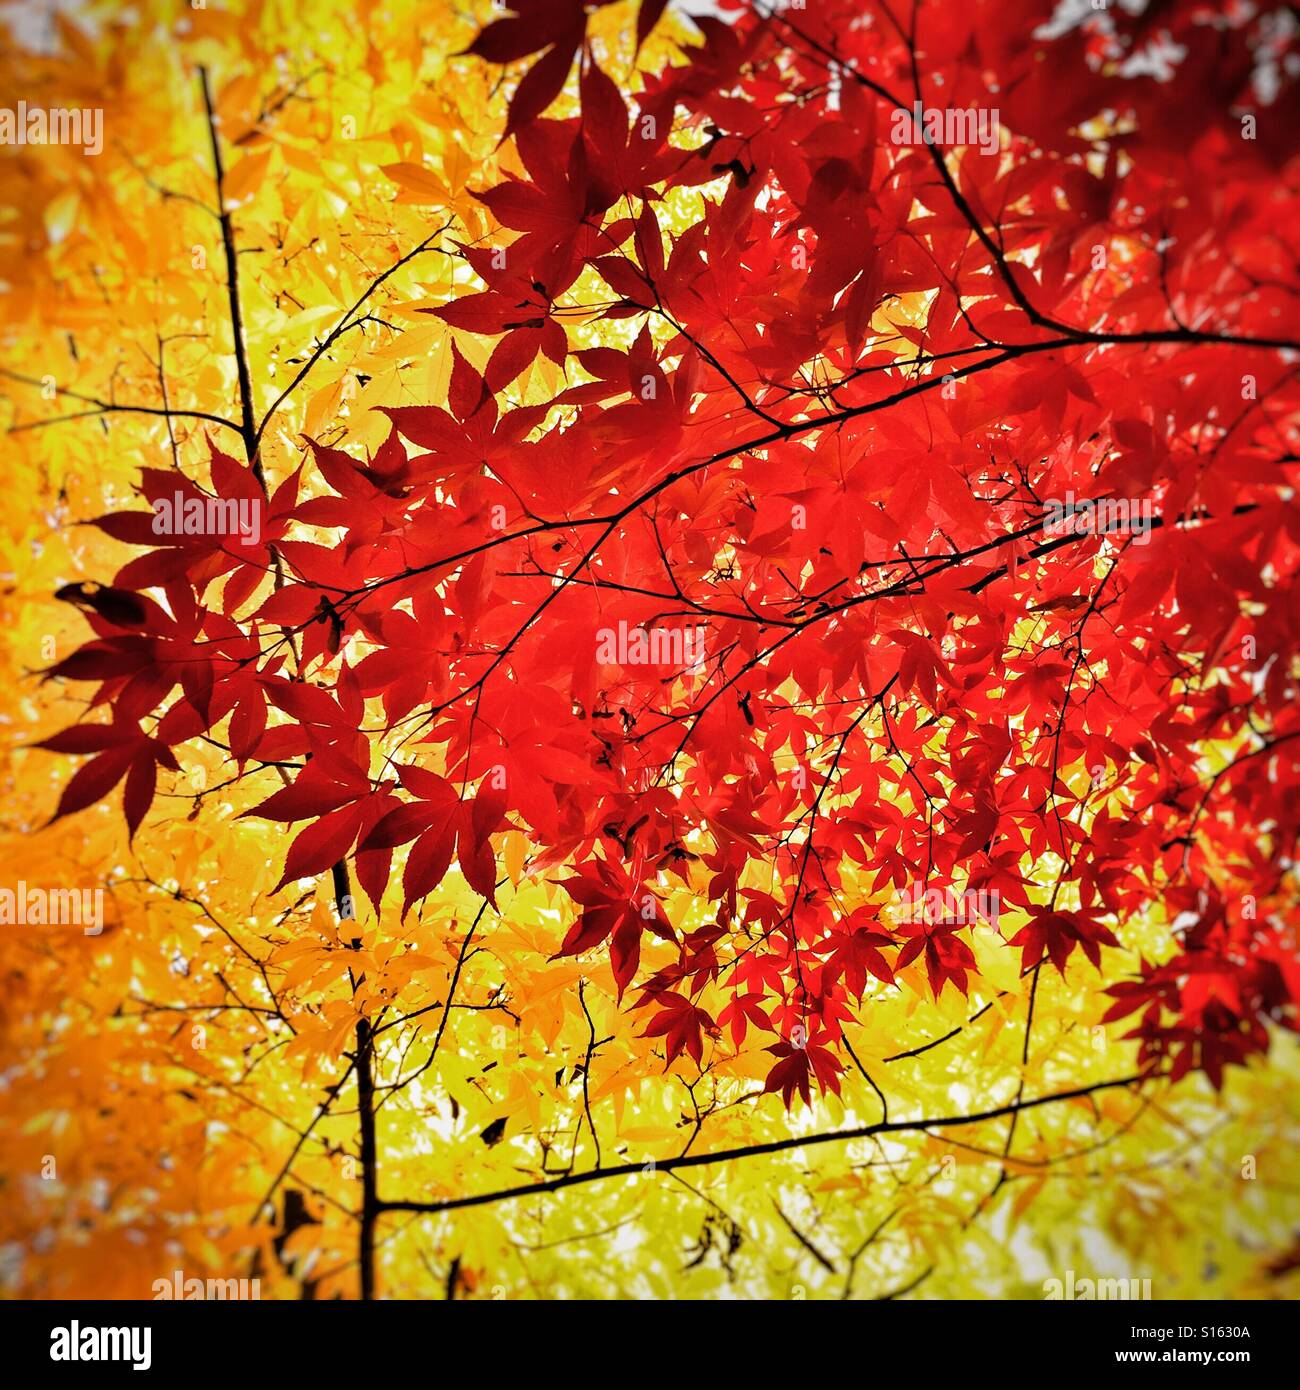 Autumn foliage and leaves at Westonbirt Arboretum Stock Photo